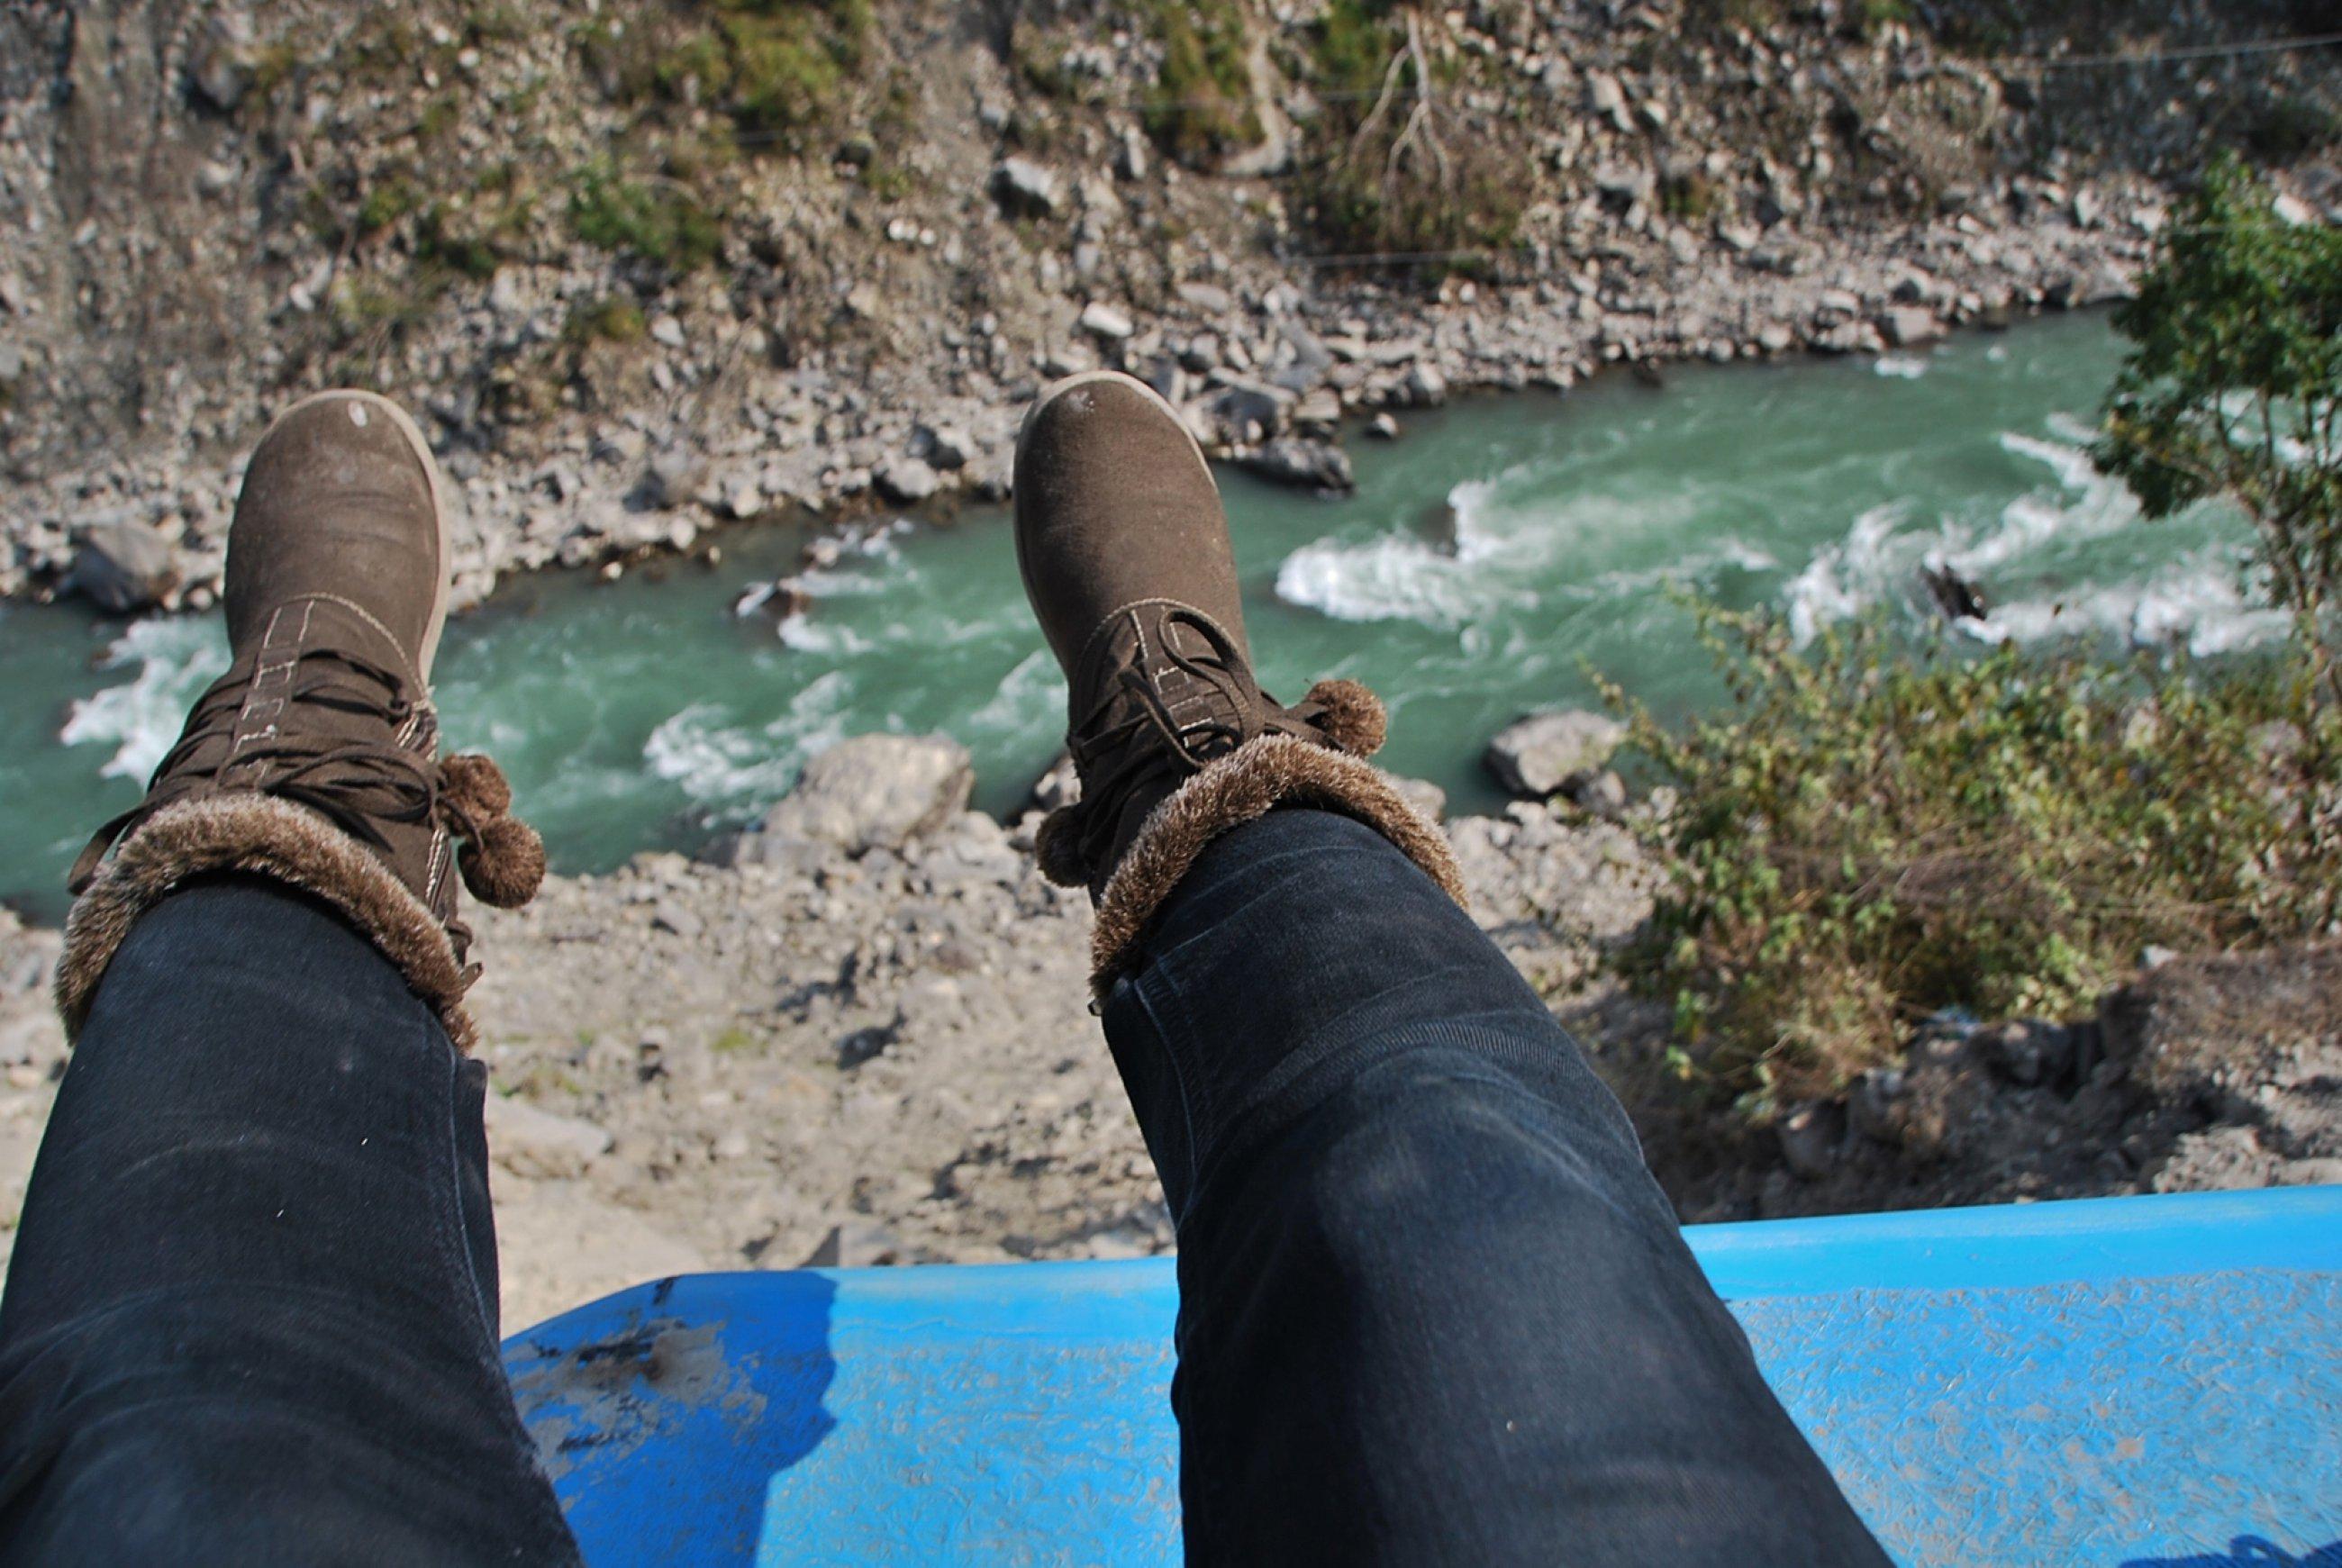 https://bubo.sk/uploads/galleries/16319/nepal-na-streche-autobusu-ctni-11-2014-mirka-sulka-334-.jpg